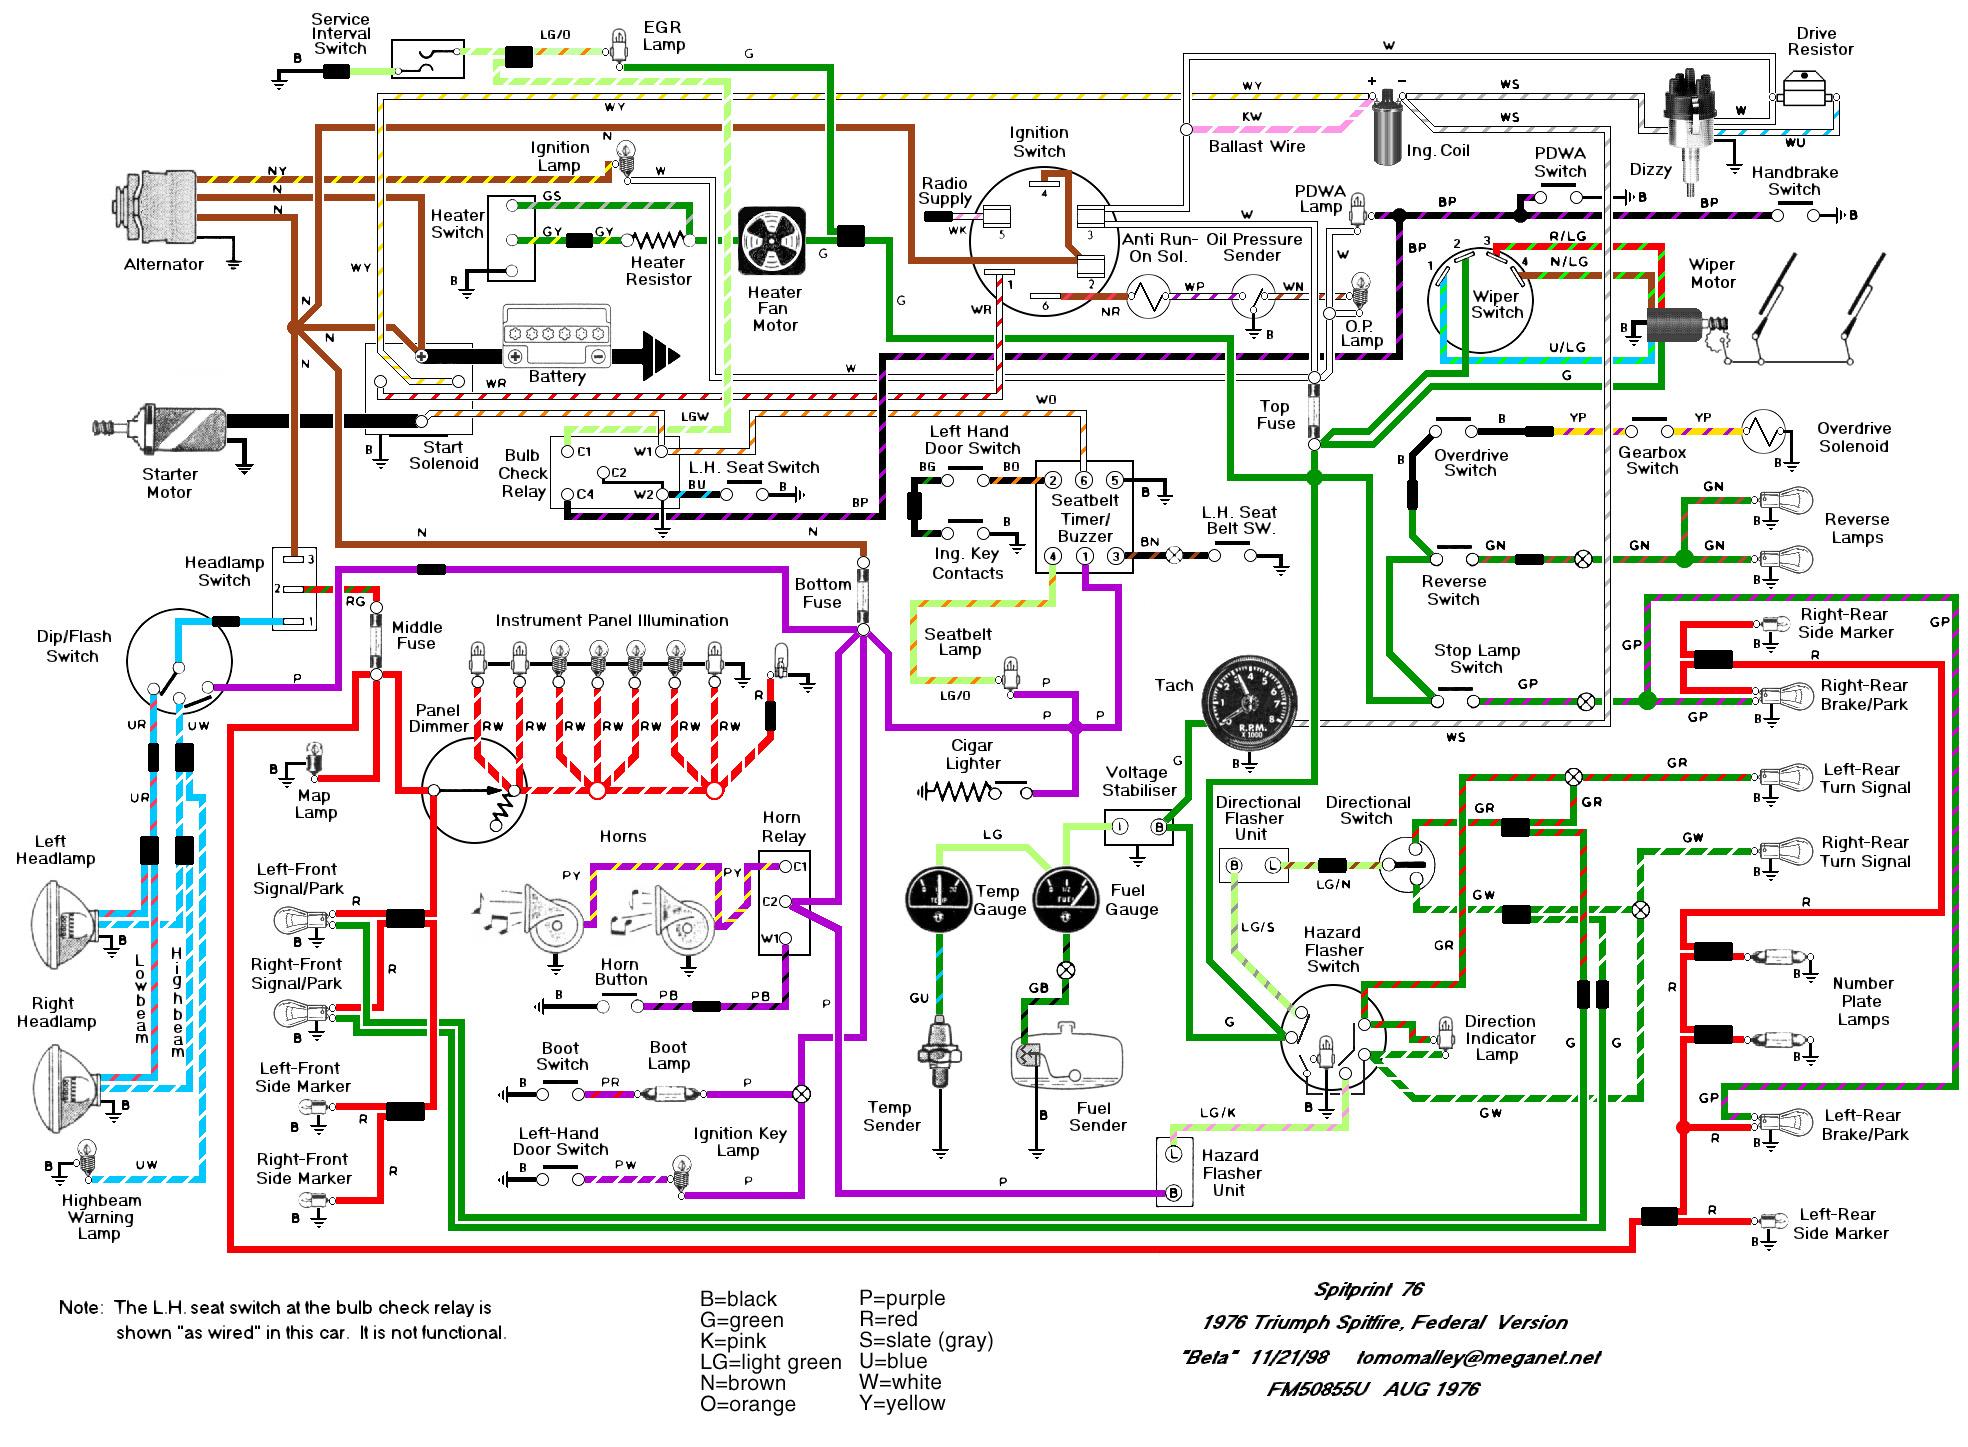 1974 yamaha rd 350 wiring diagram 1974 yamaha dt 100 wiring diagram elsavadorla